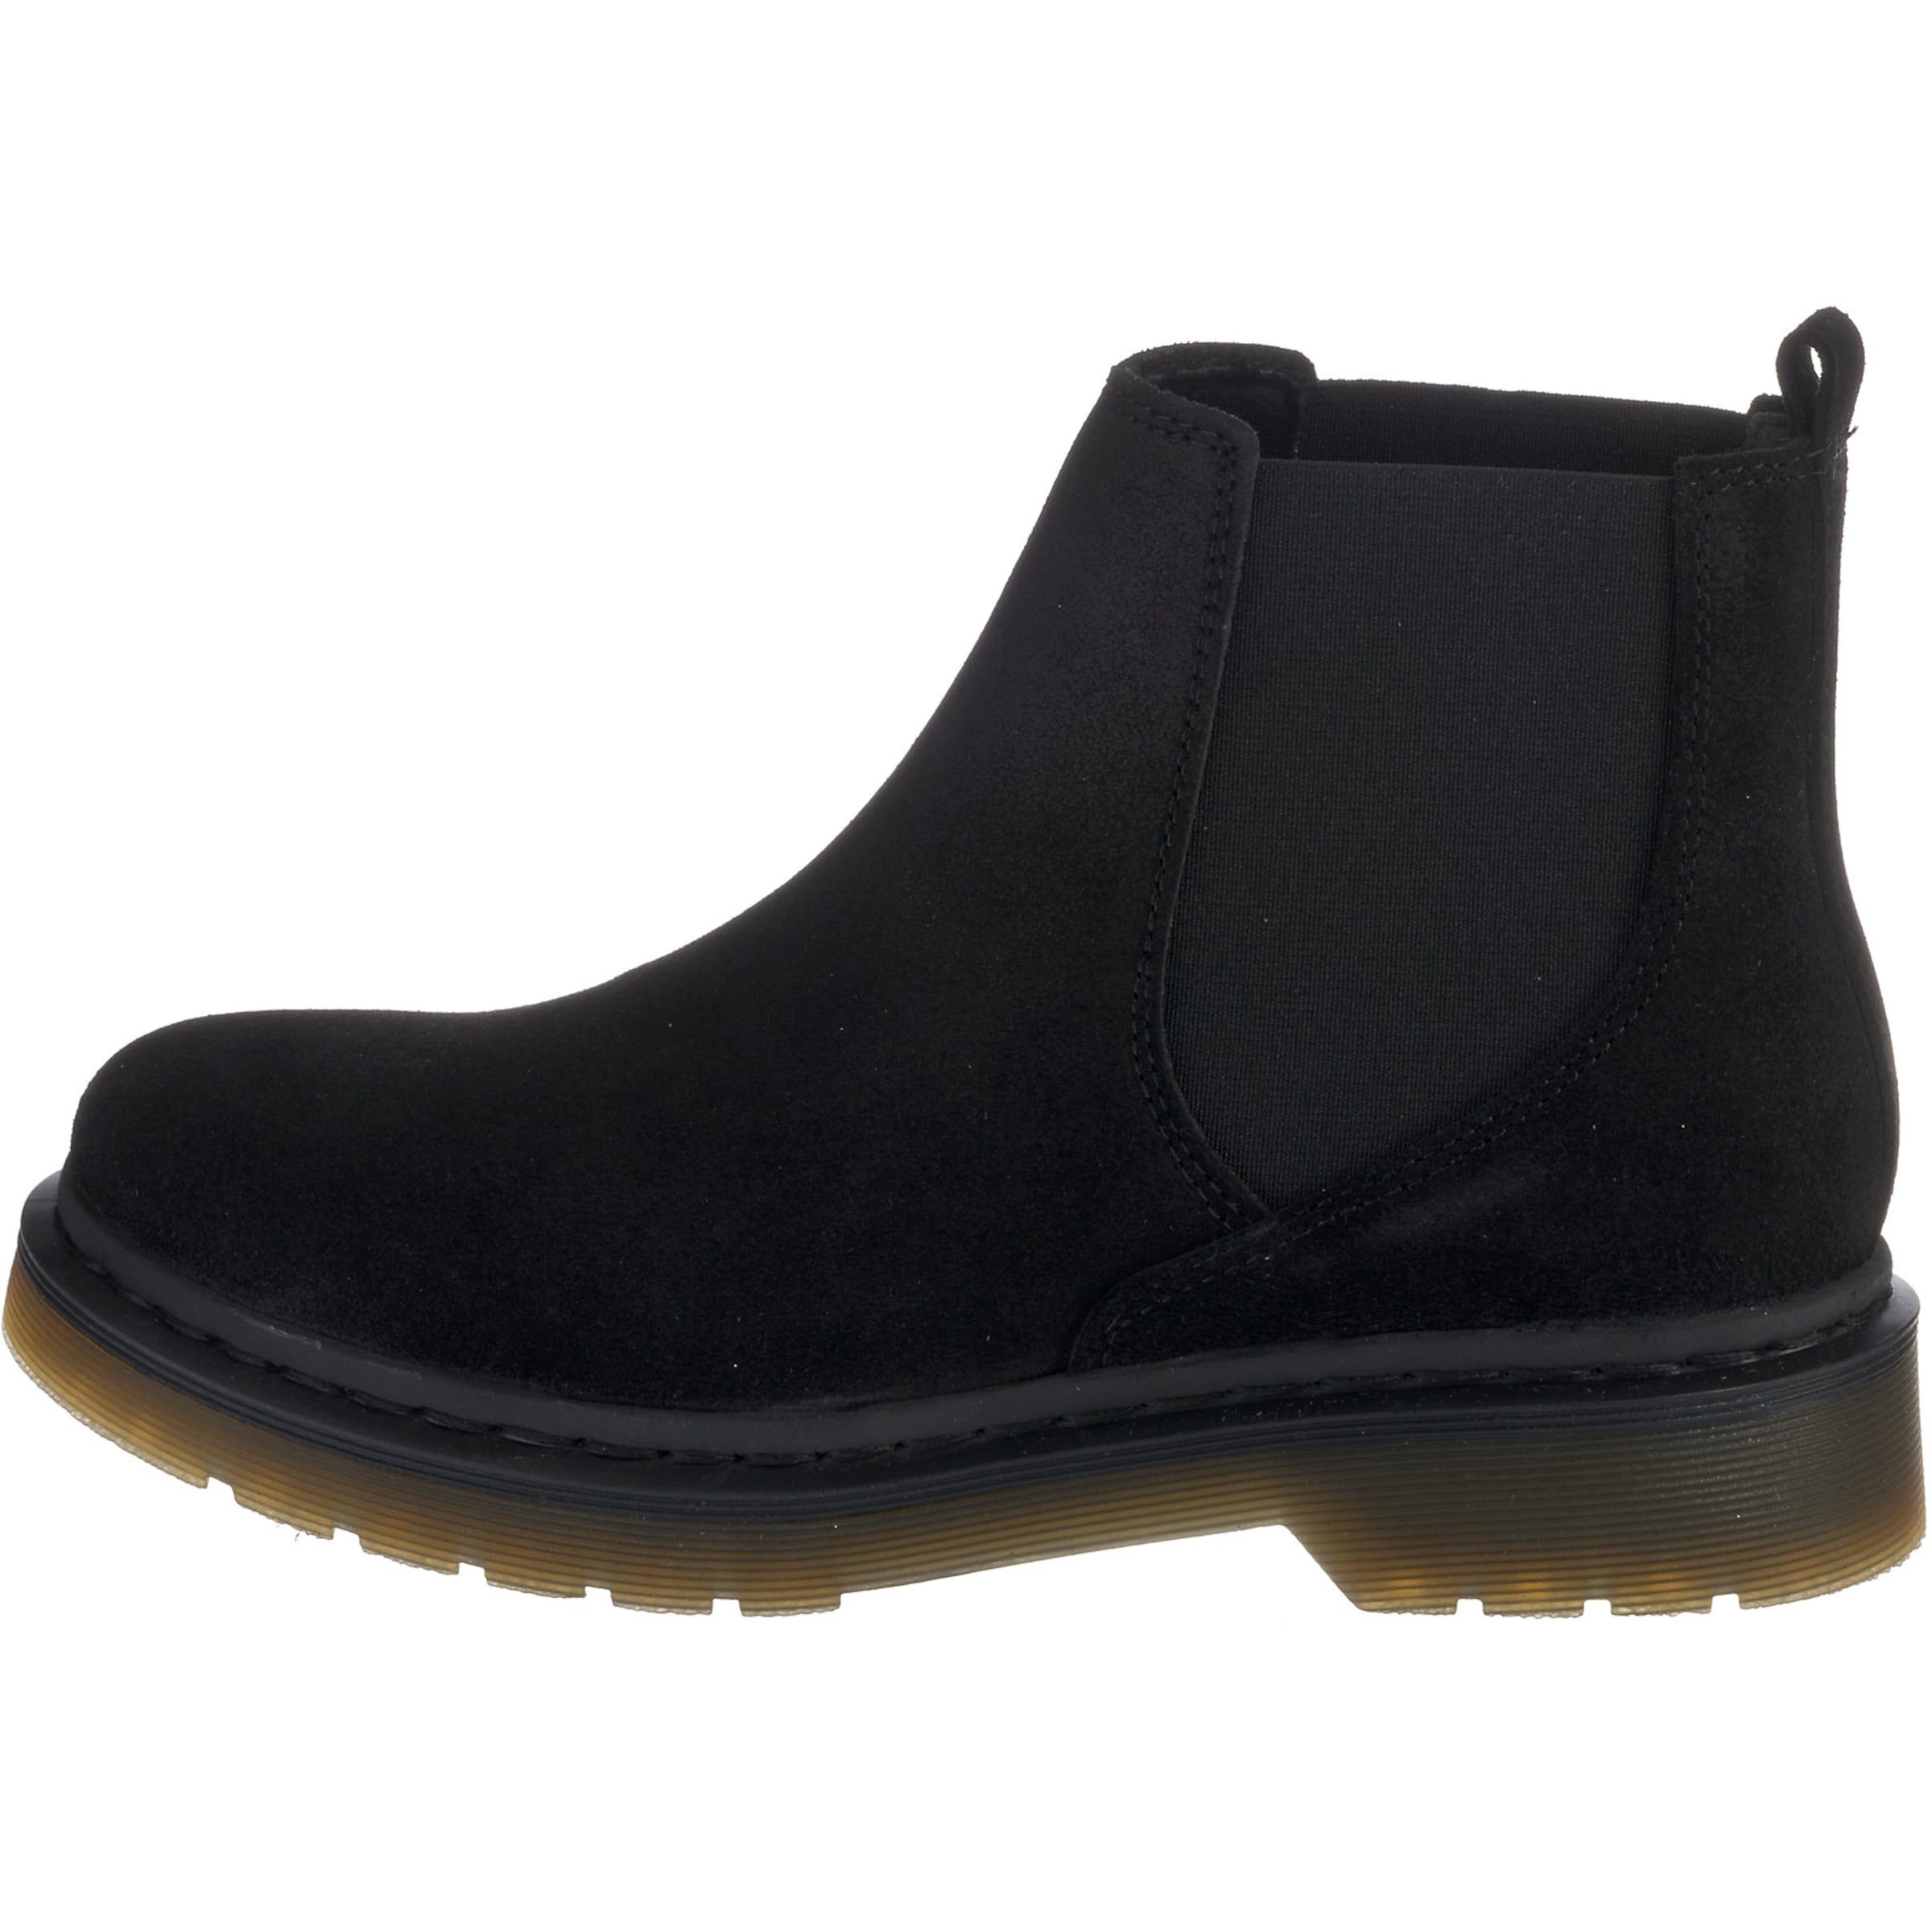 Tamaris Boots Tamaris Boots Chelsea In Tamaris Schwarz Chelsea Chelsea Boots In Schwarz e9YbWEDH2I